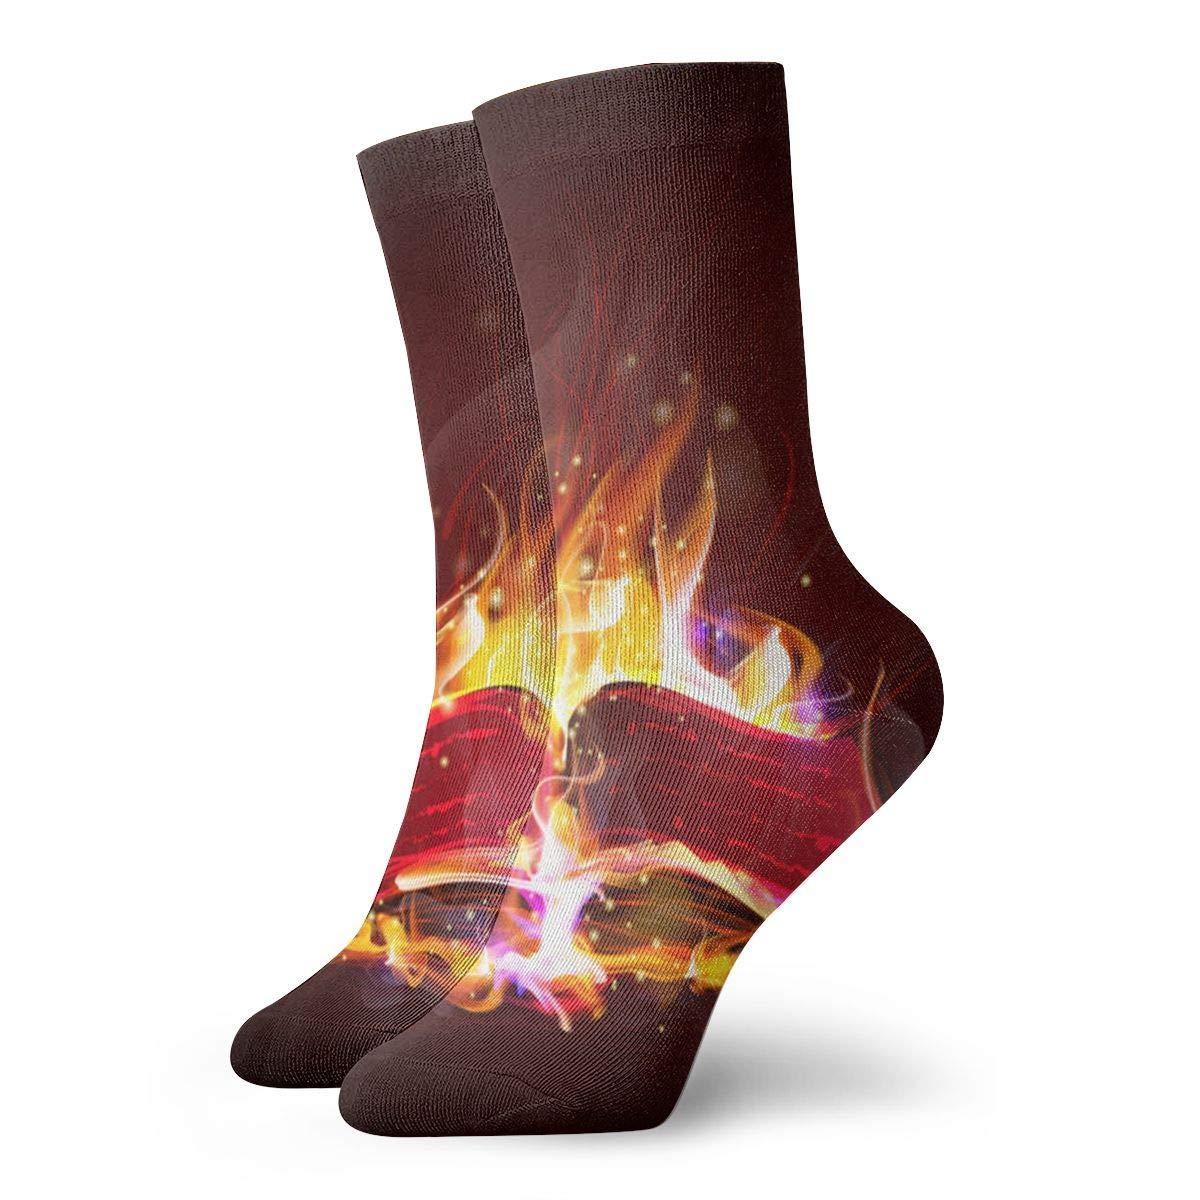 WEEDKEYCAT Originality Blaze Book Adult Short Socks Cotton Funny Socks for Mens Womens Yoga Hiking Cycling Running Soccer Sports